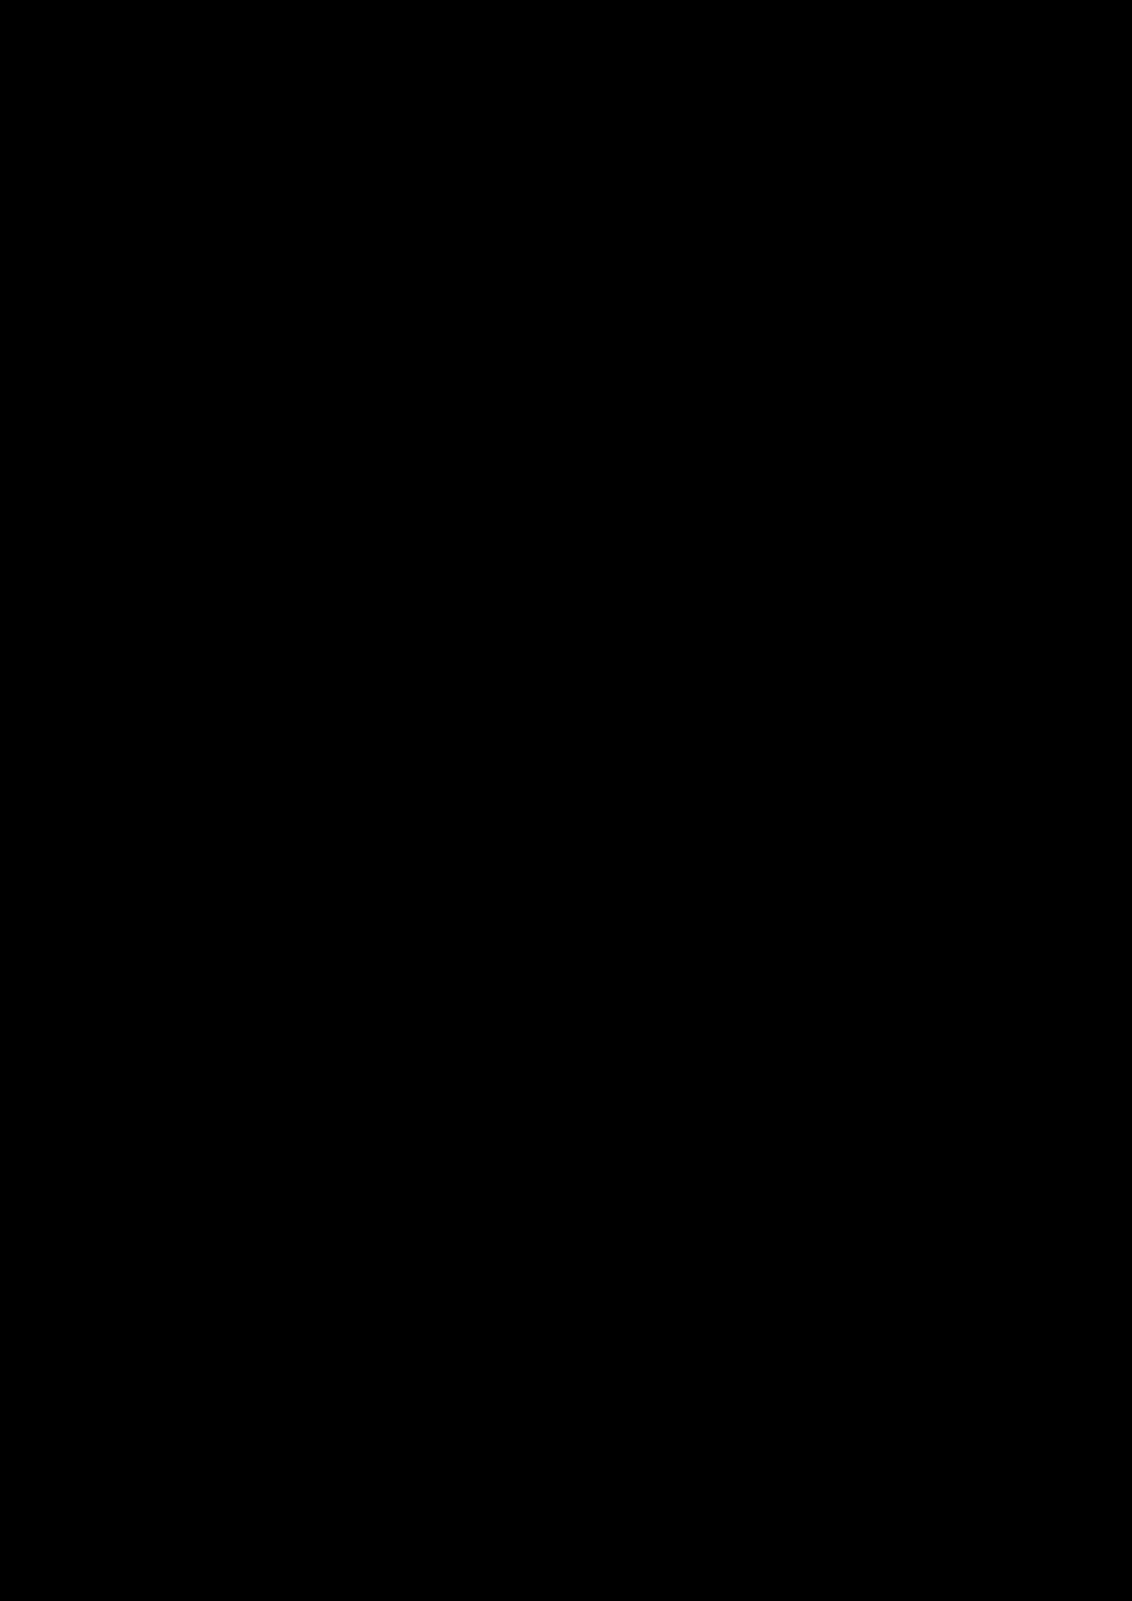 Belyiy sokol slide, Image 96